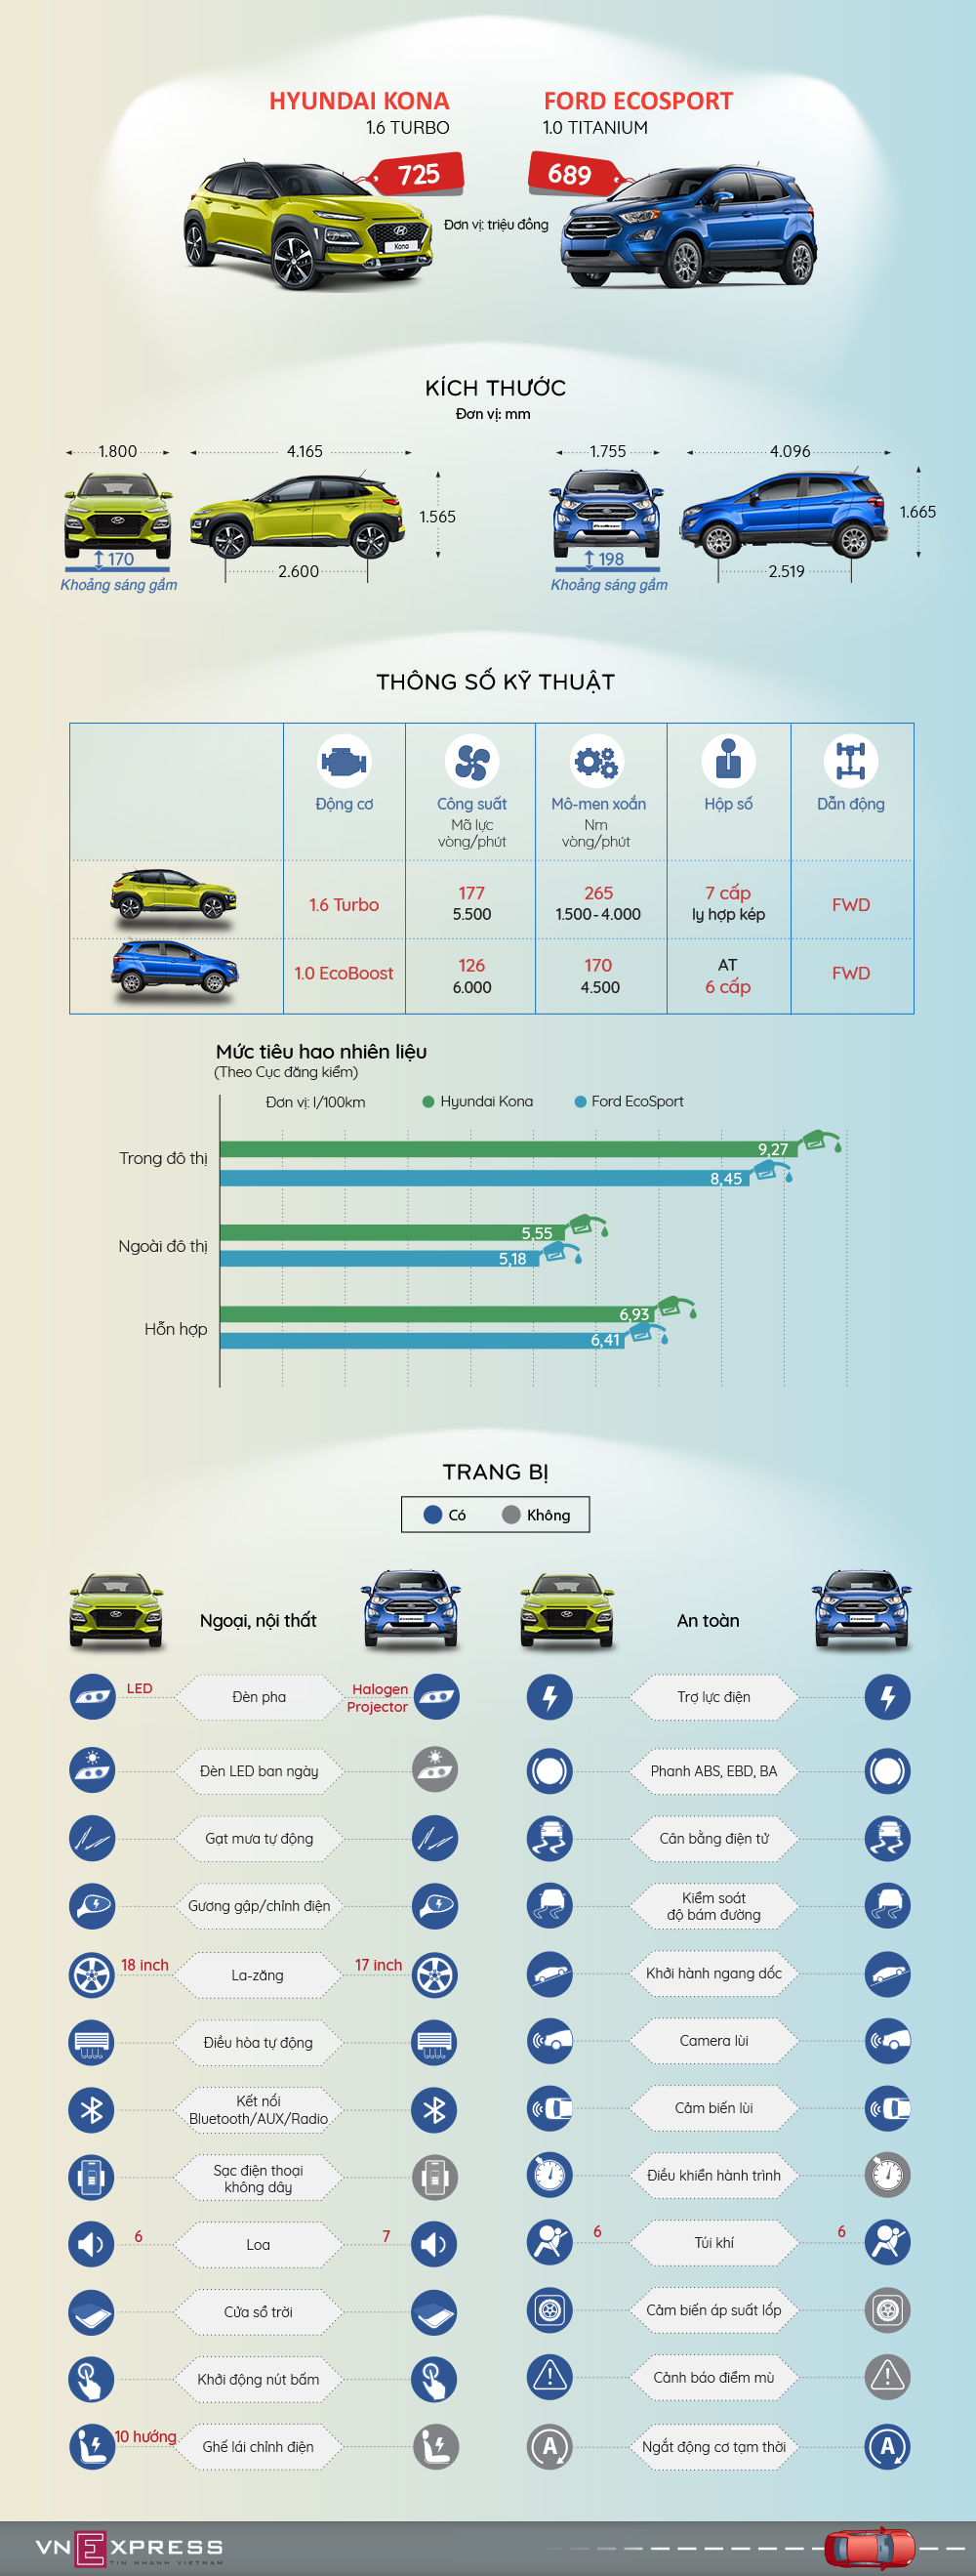 Xe gam cao co nho - chon Ford EcoSport hay Hyundai Kona